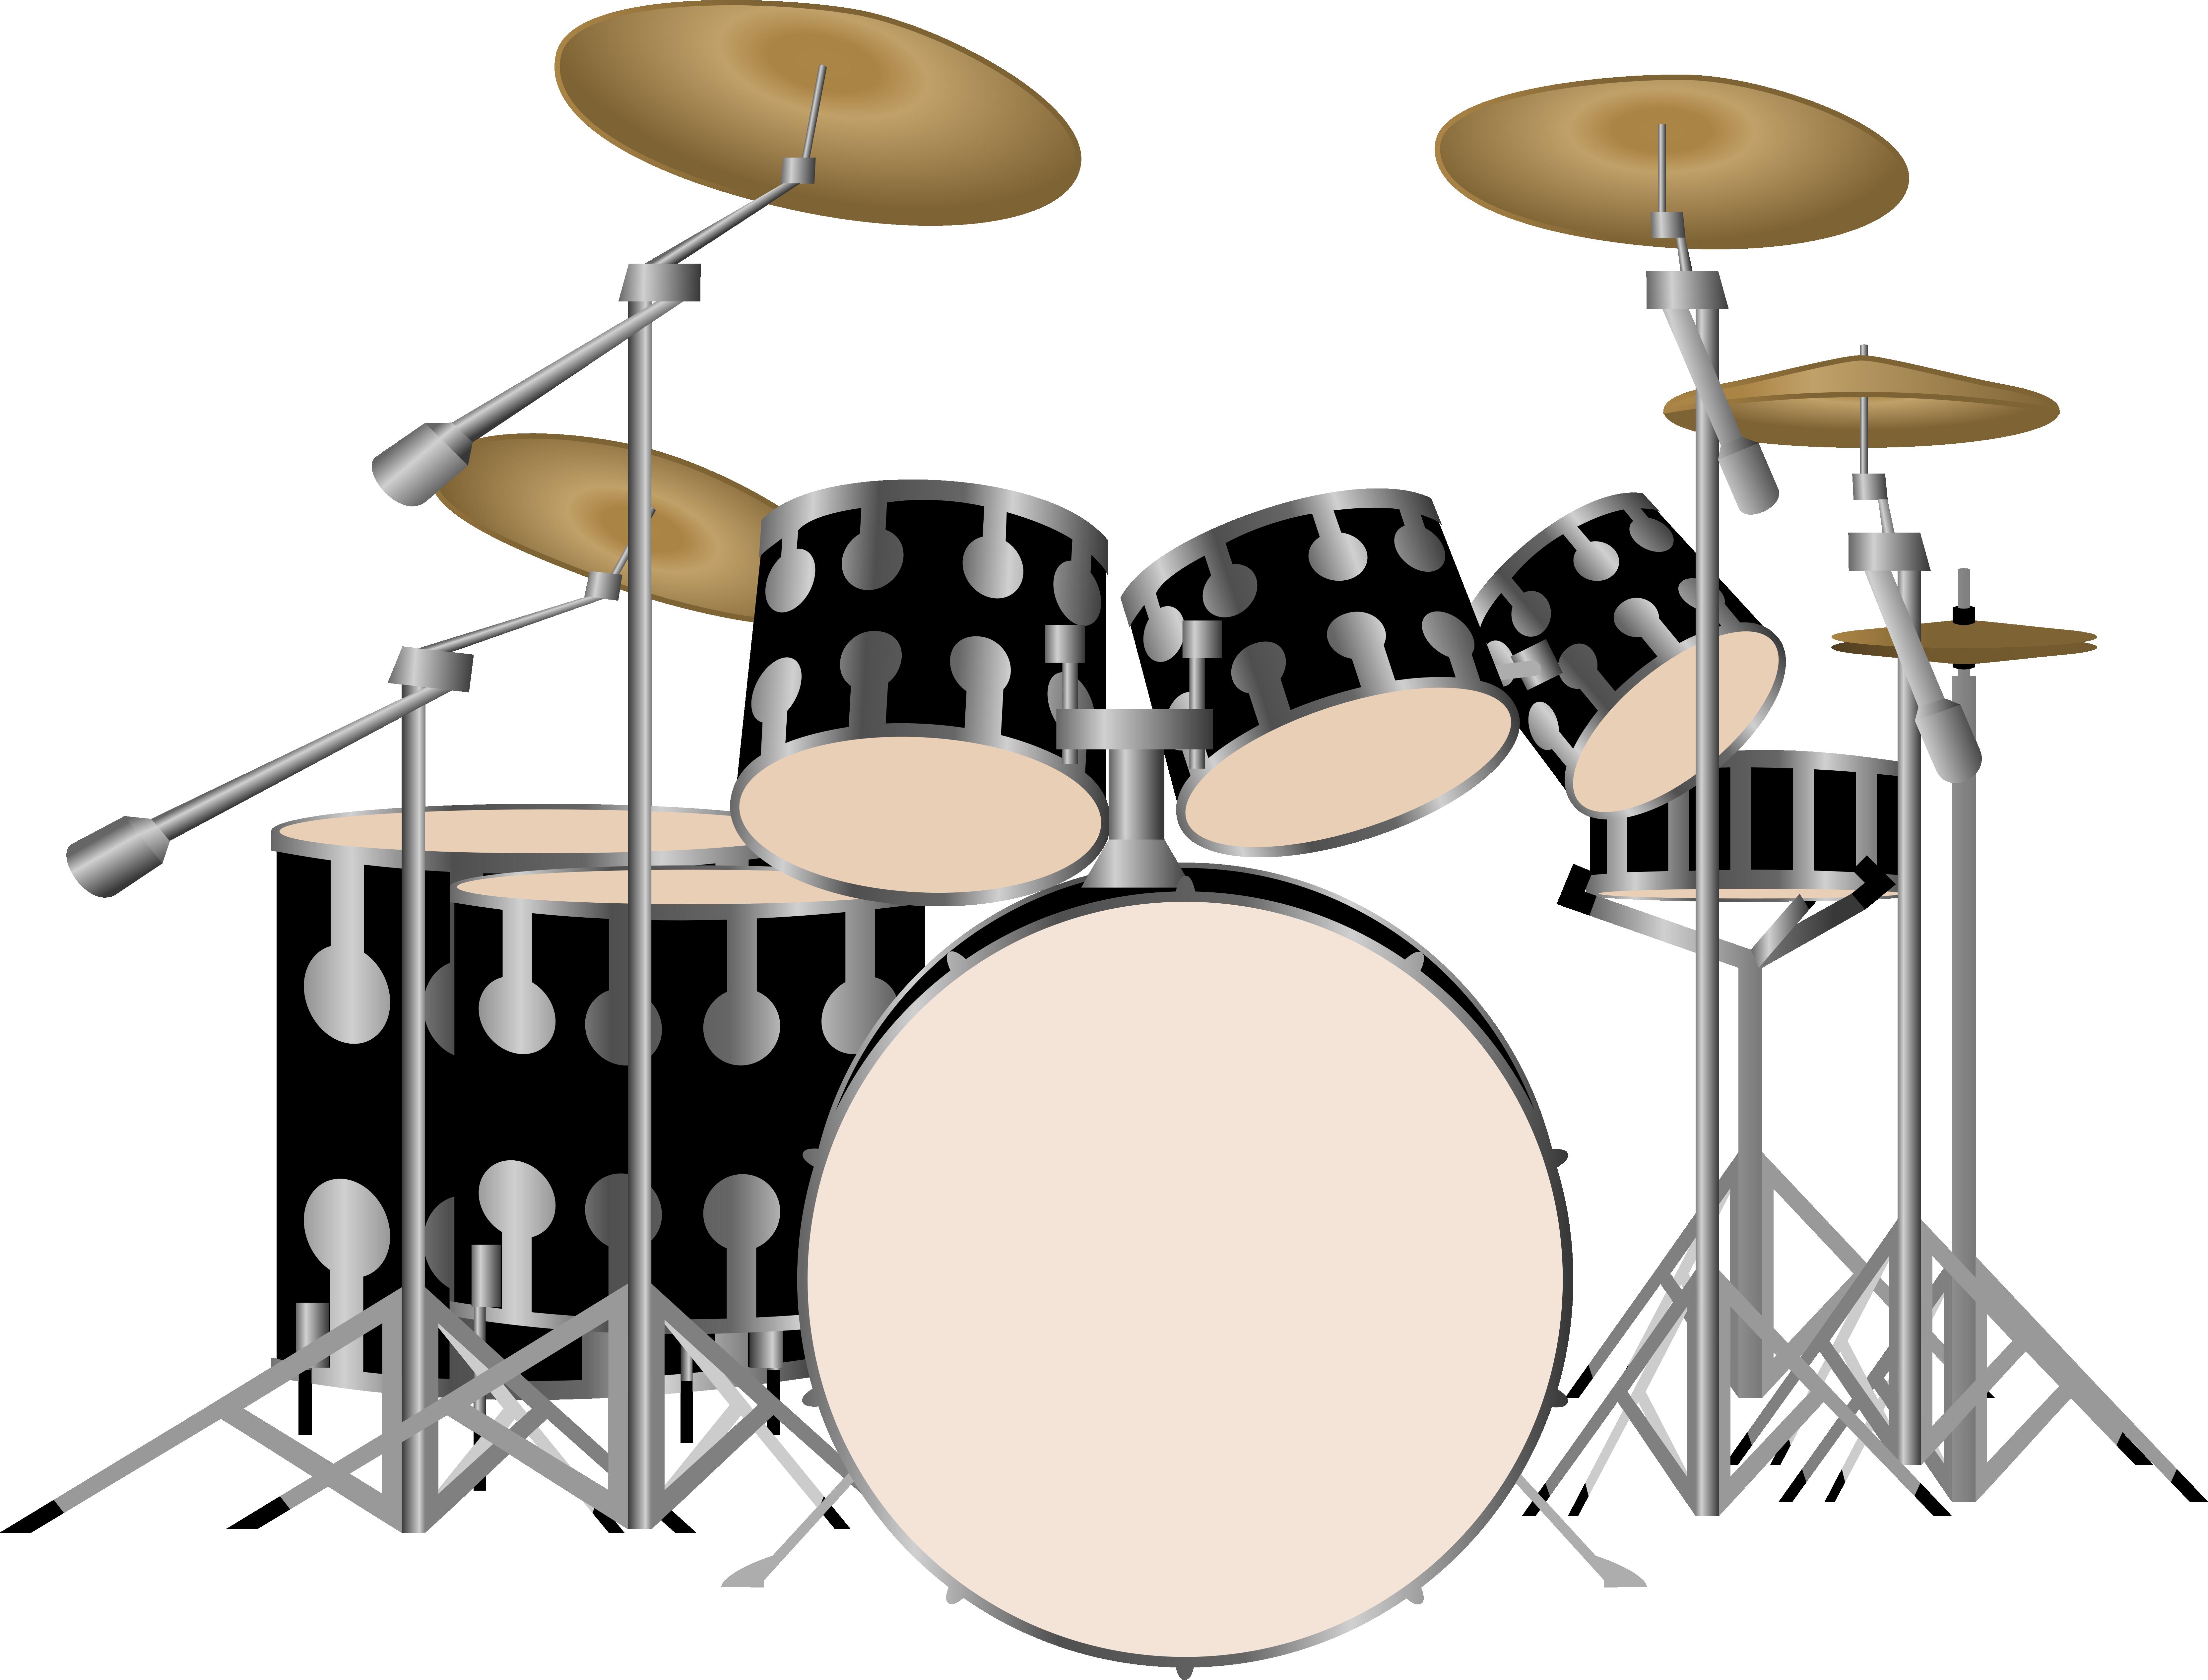 guitar hero drum set instructions